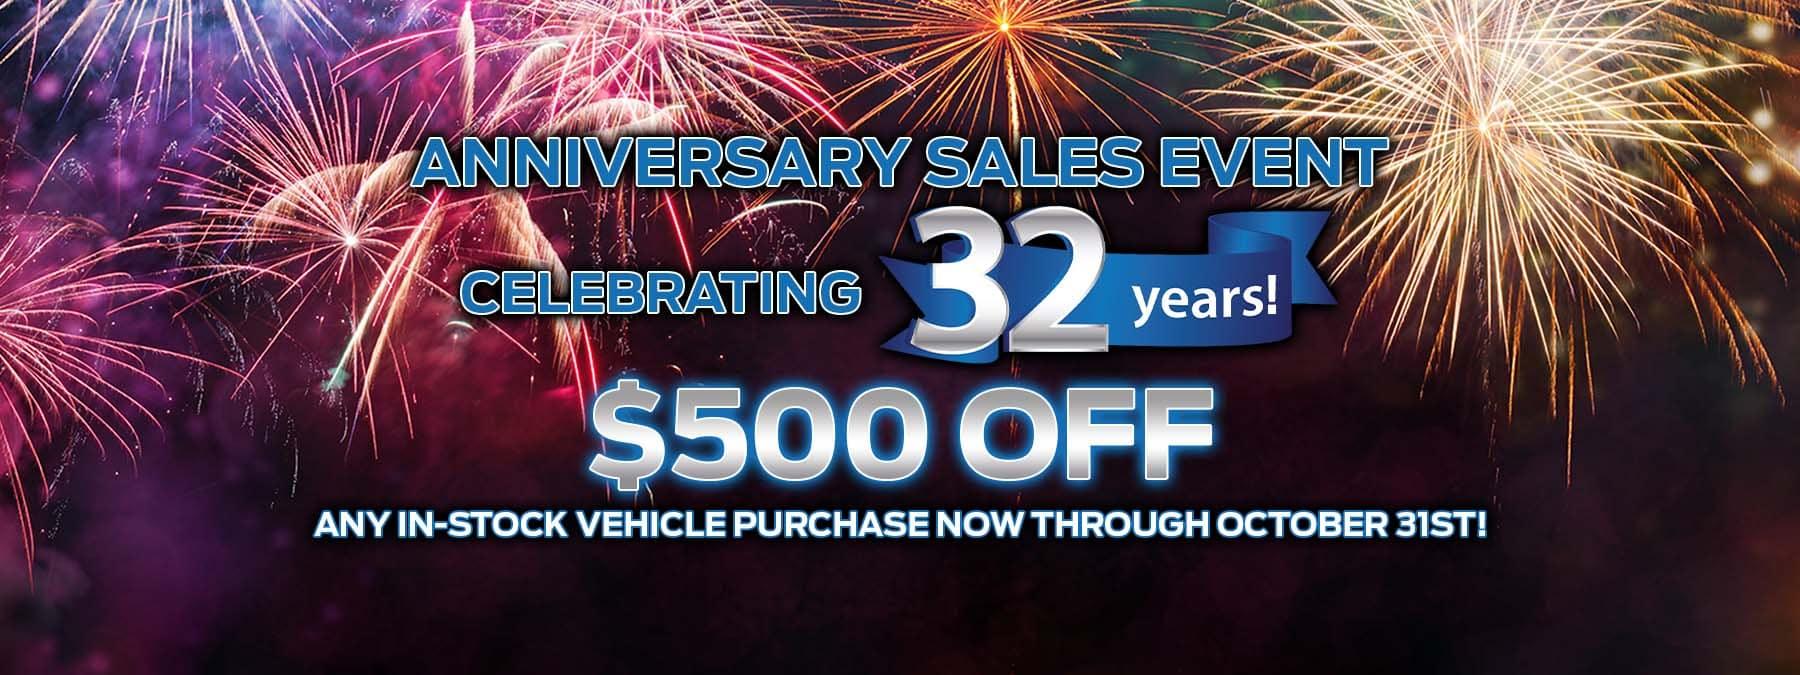 $500 Off Anniversary Sales Event